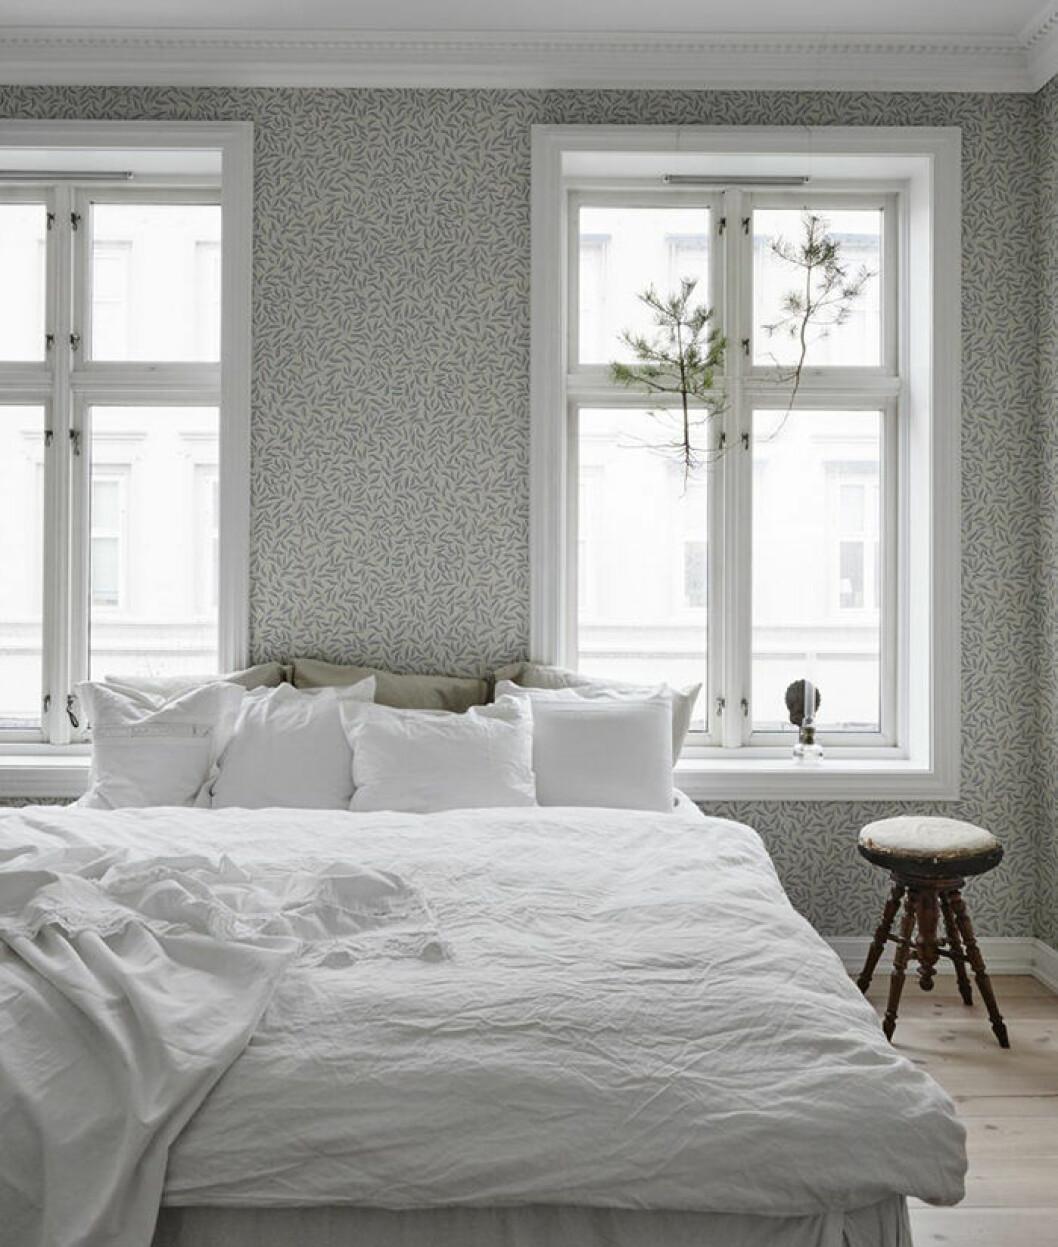 Småbladig tapet i sovrummet från Sandberg Wallpaper